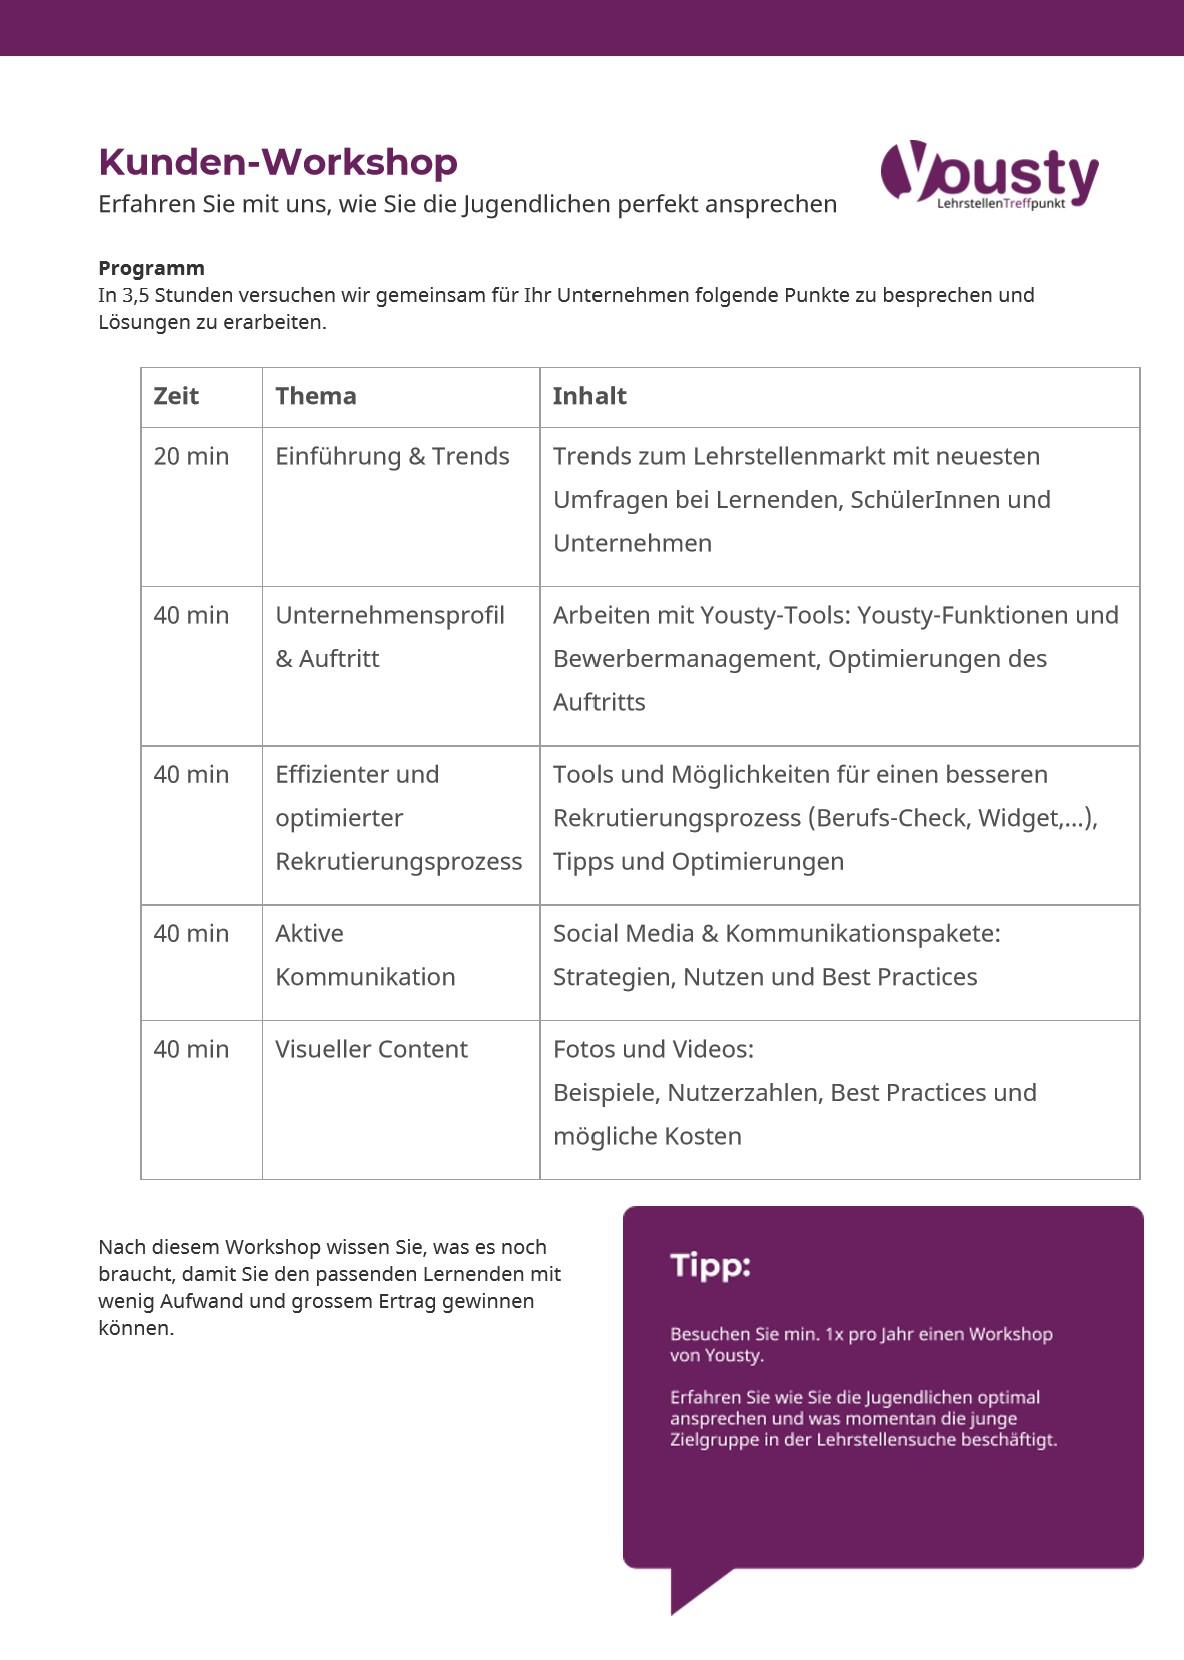 Kunden-workshop-hubspot